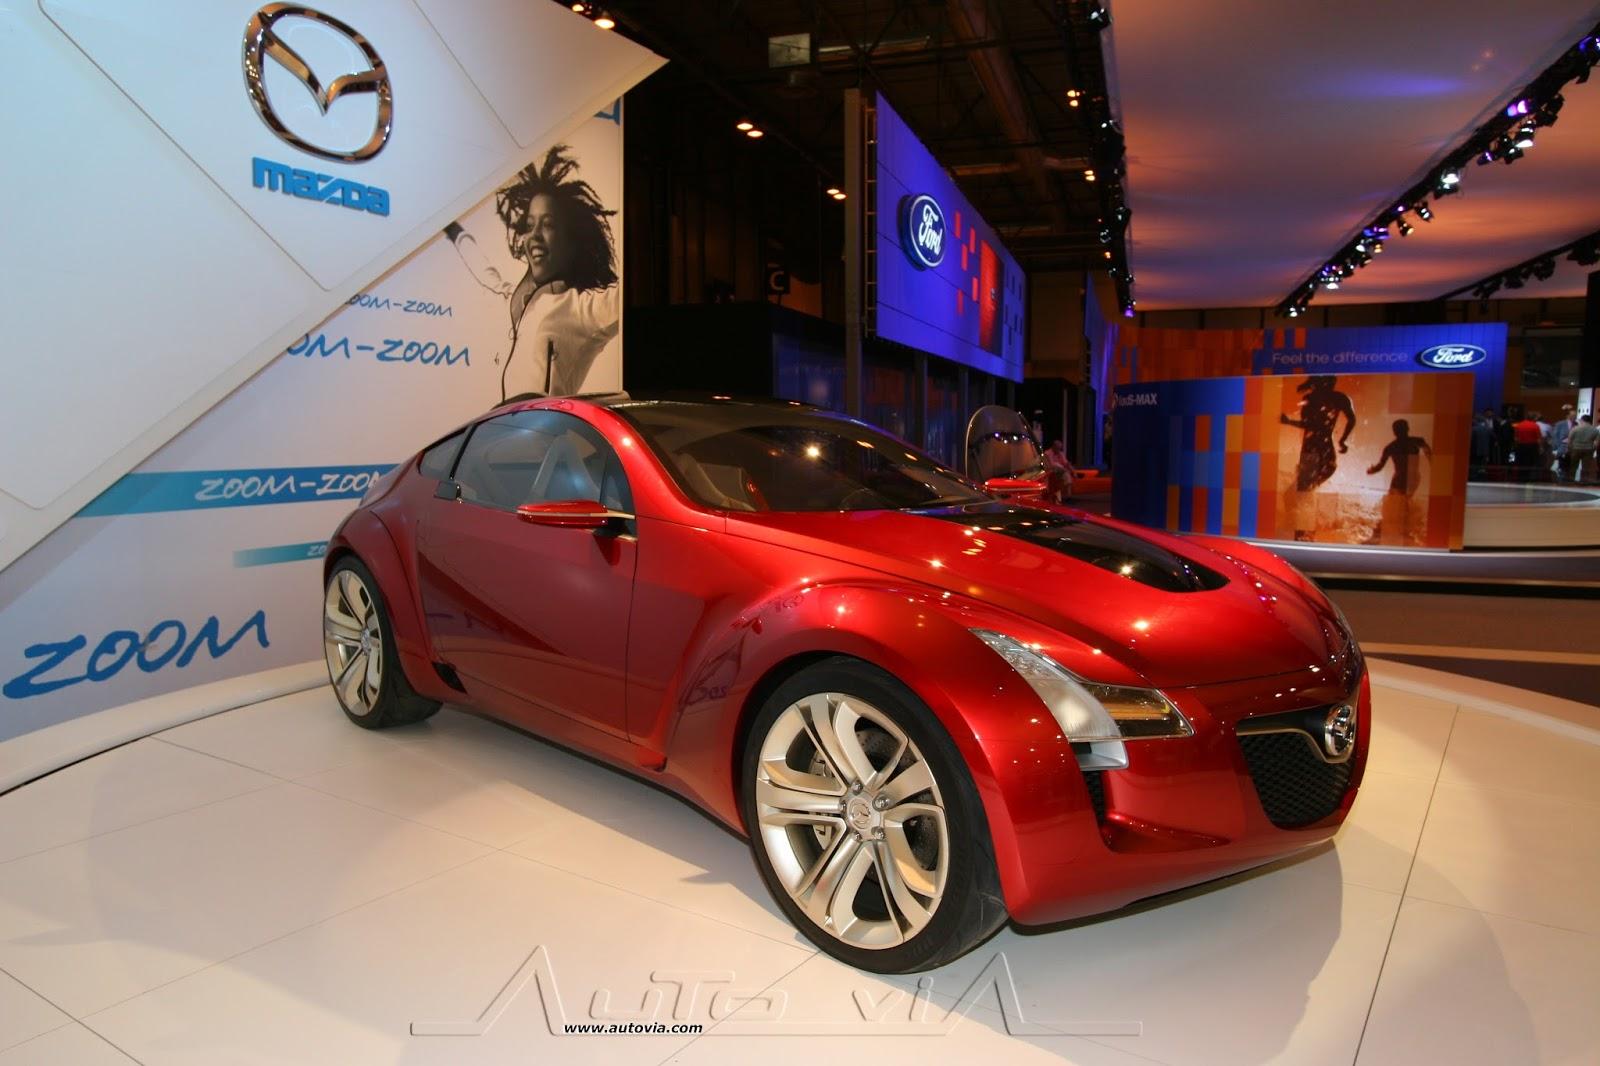 RX3 Τριρότορο, biturbo, με 450 άλογα, το Mazda RX-9 ετοιμάζεται να φτύσει φλόγες concept, Mazda, Mazda RX-9, RX-7, rx-8, Wankel, zblog